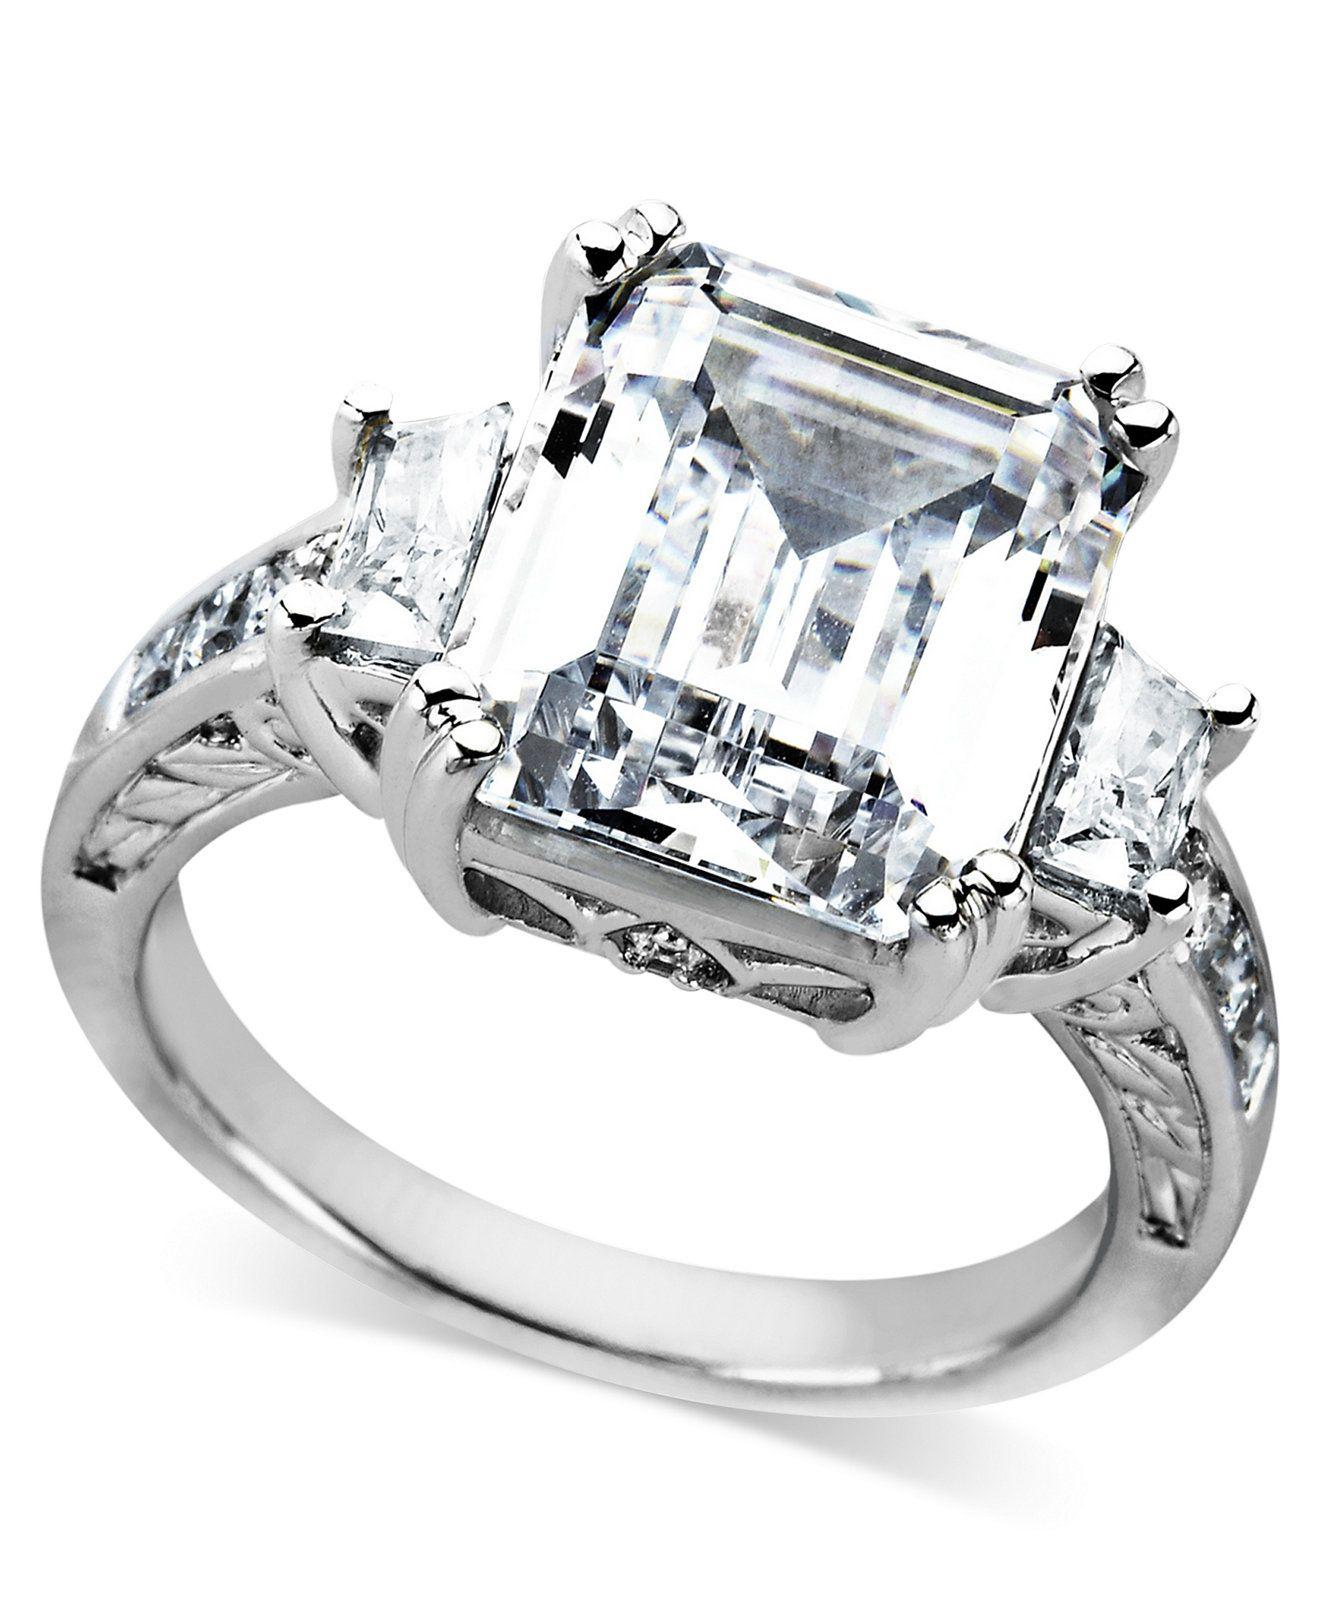 eb753ff55bd5 Arabella Sterling Silver Ring